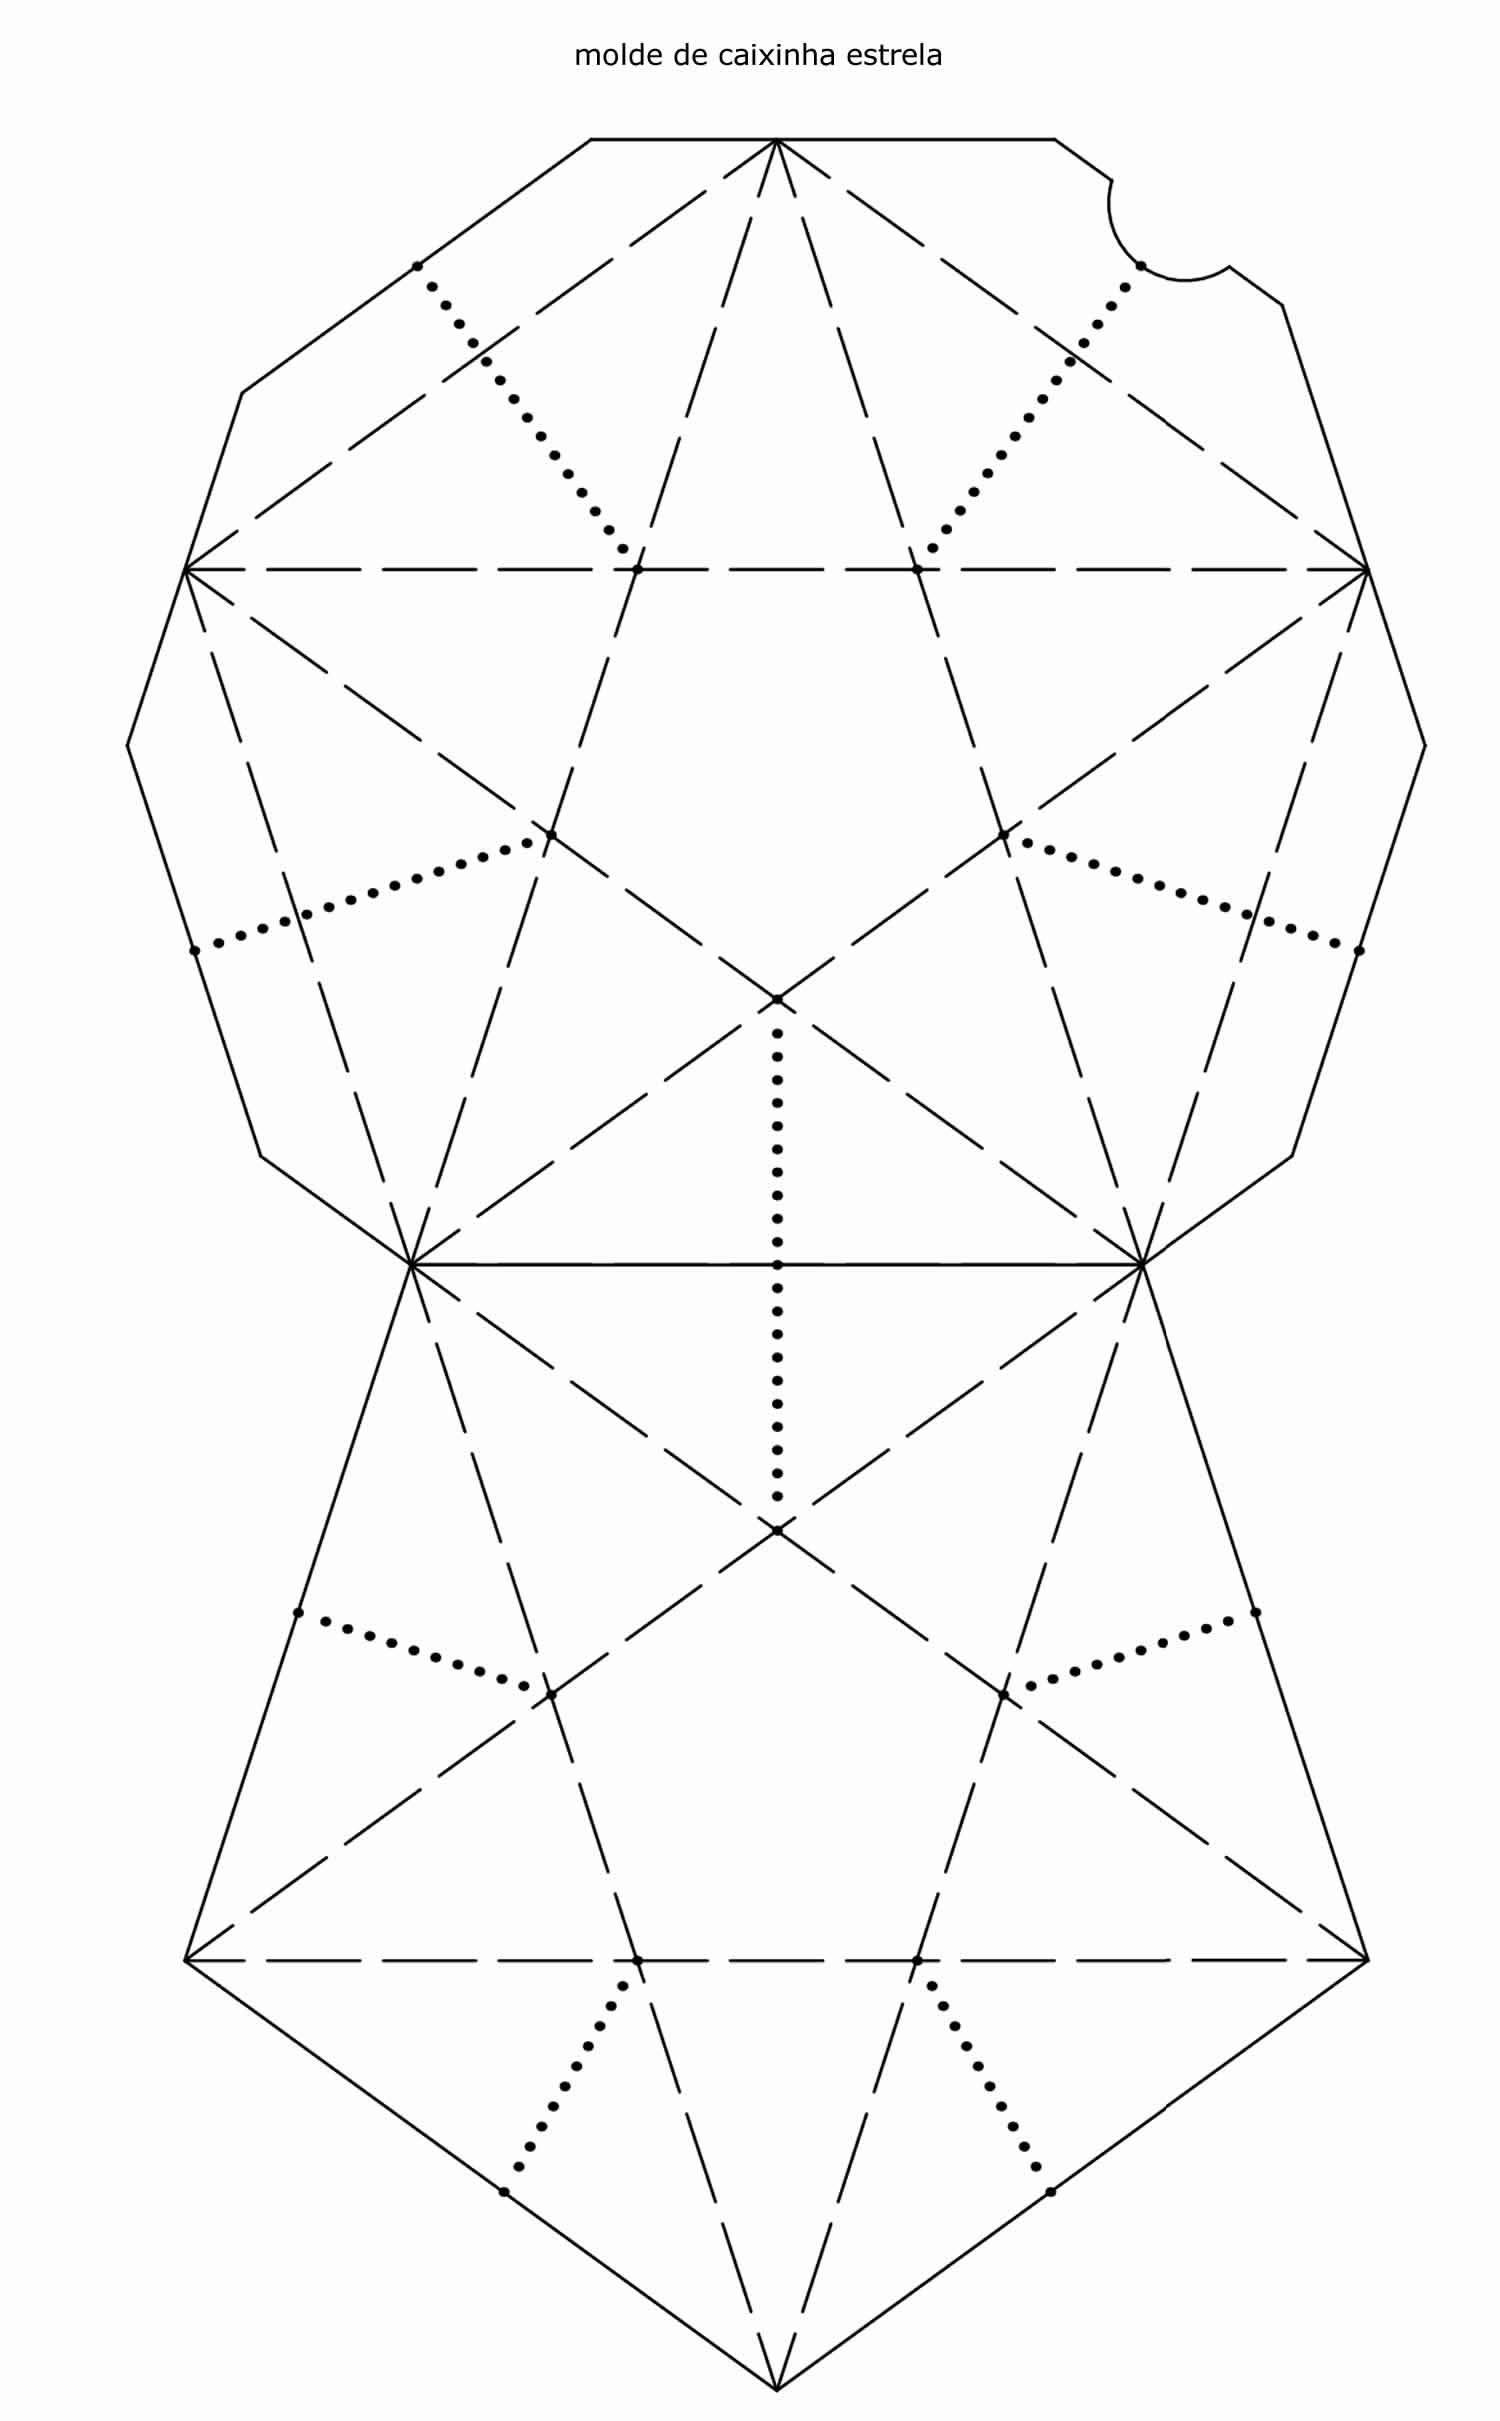 Molde de Caixinha Estrela